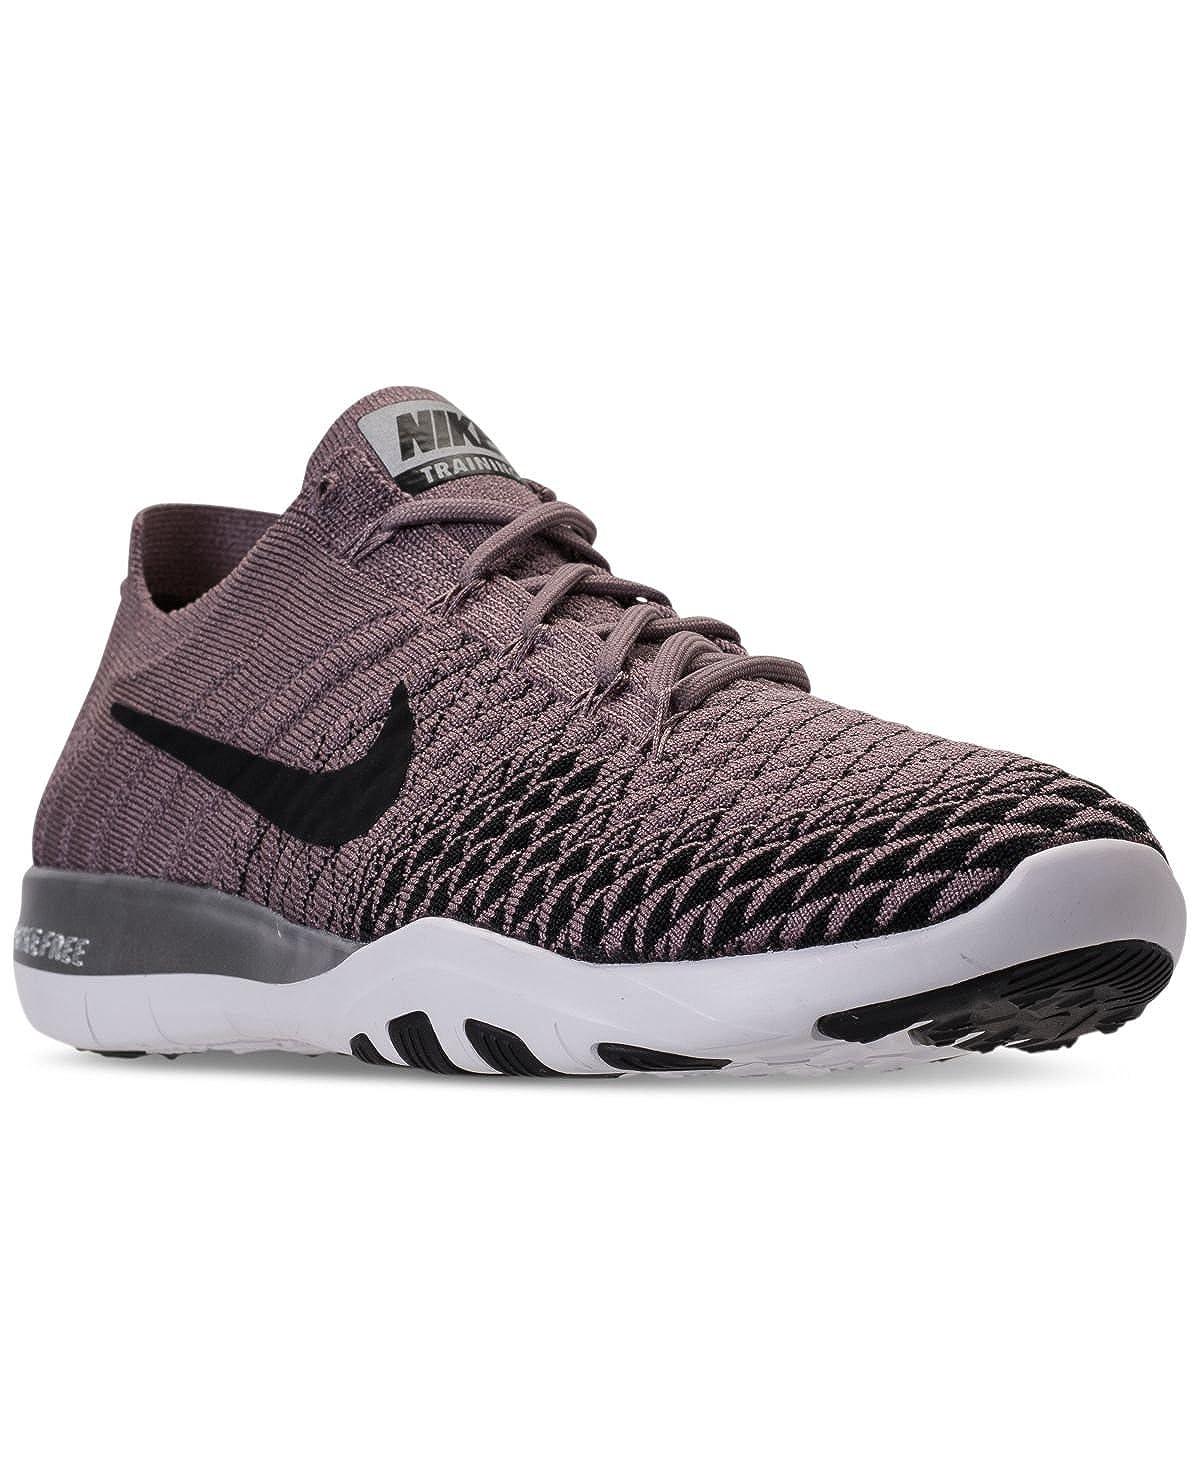 buy online 873be f14bb Amazon.com   Nike Free TR FK 2 Bionic 904654-200 Taupe Grey Black-Chrome  Women s US 9   Road Running